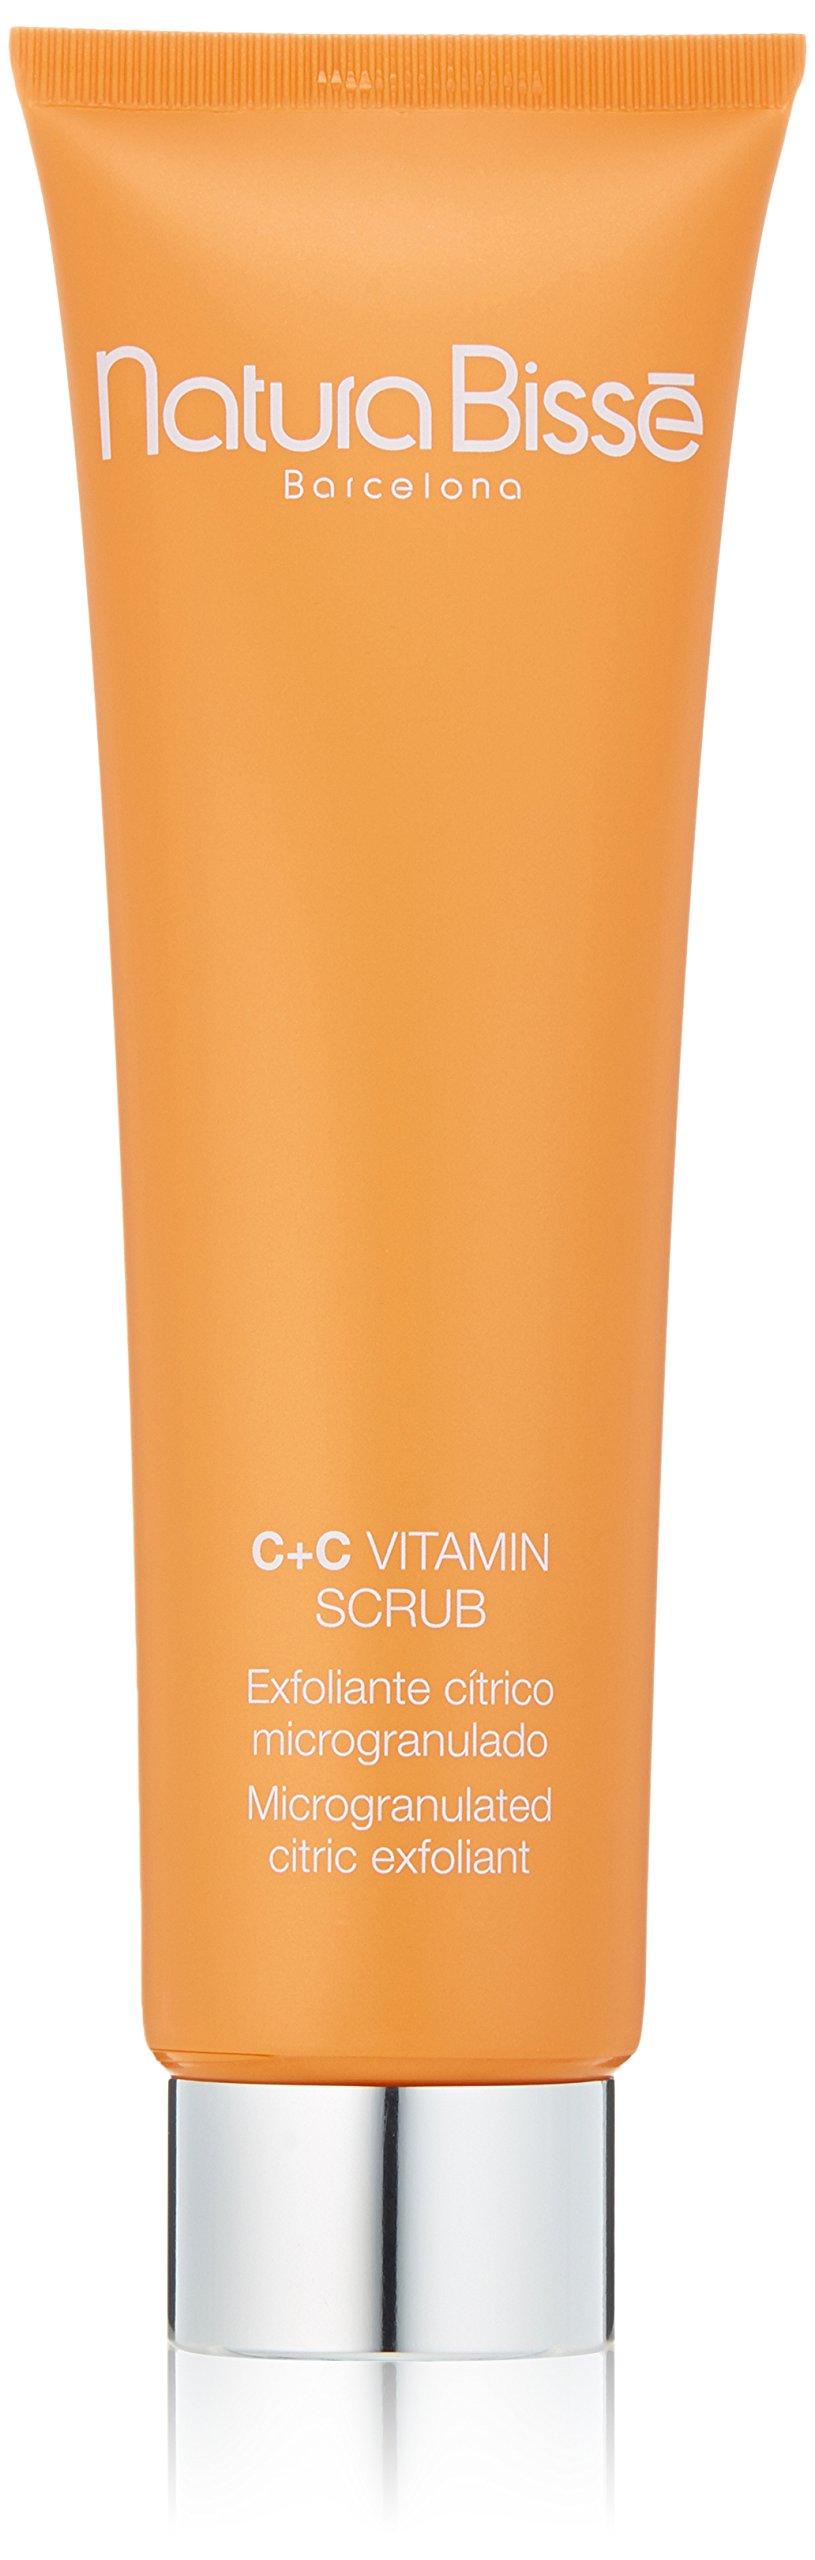 Natura Bisse C+C Vitamin Scrub, 3.5 fl. oz.